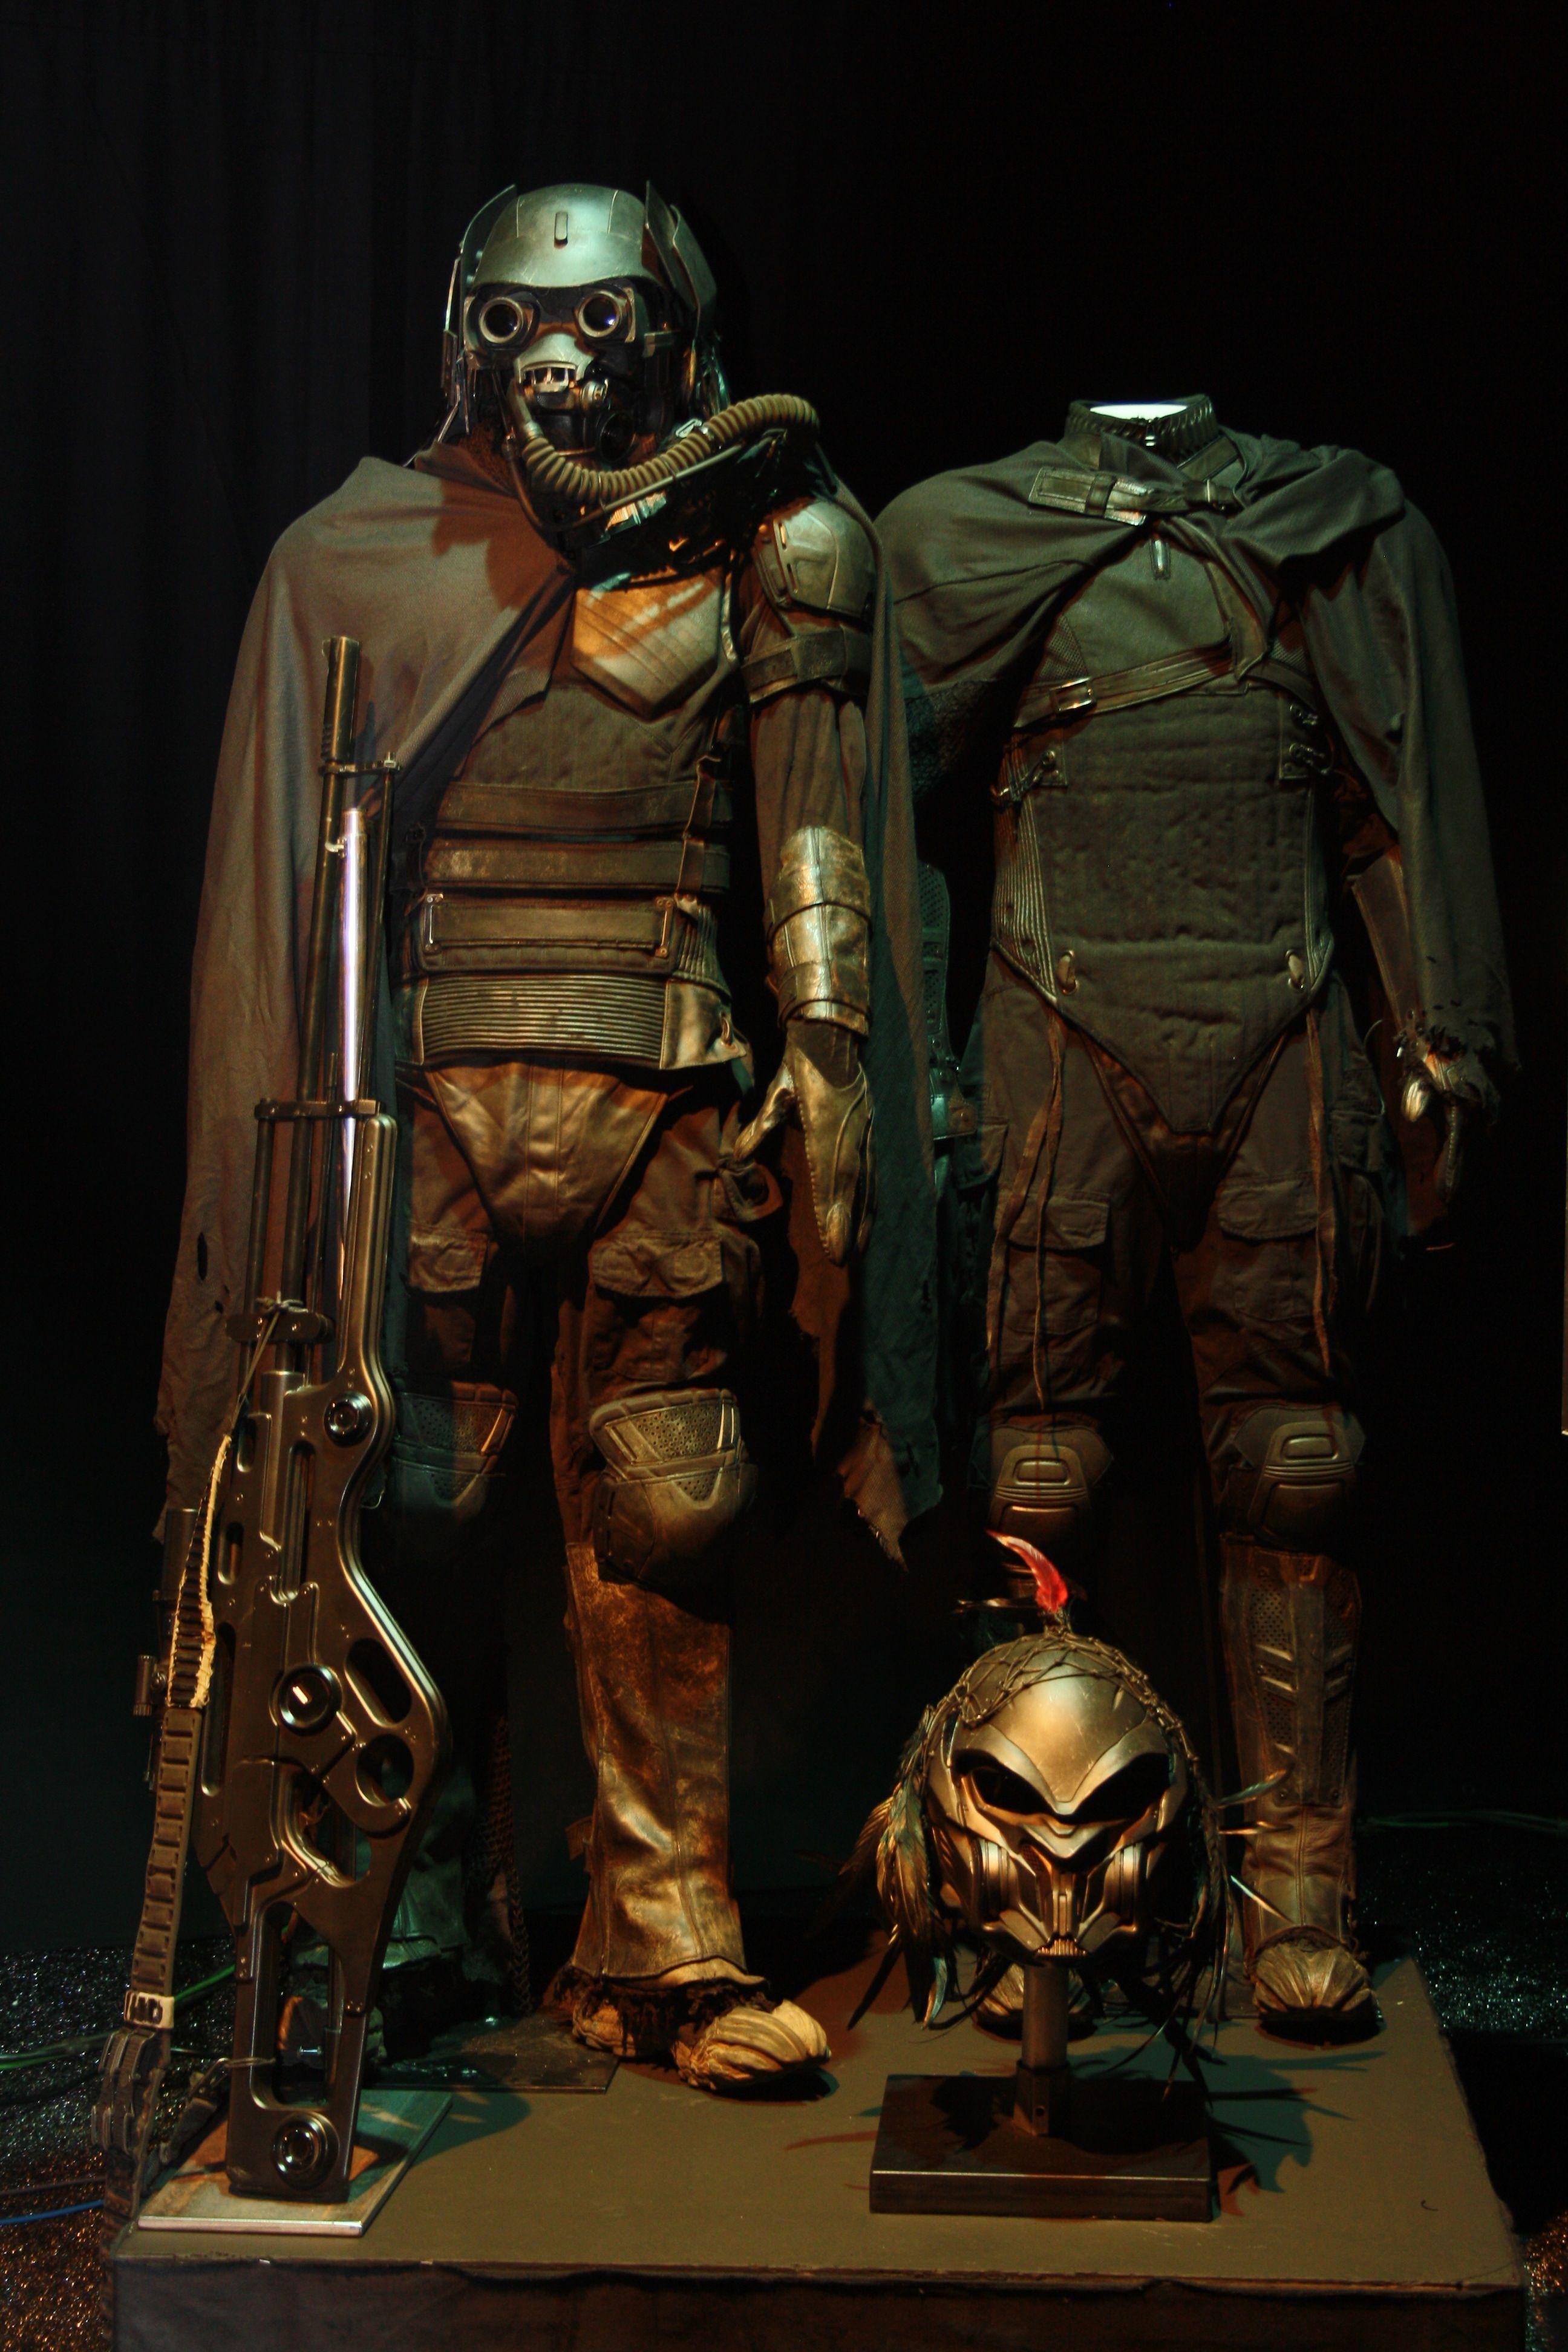 Scav Costumes #OBLIVION   Oblivion   Pinterest   Oblivion, Costumes ...